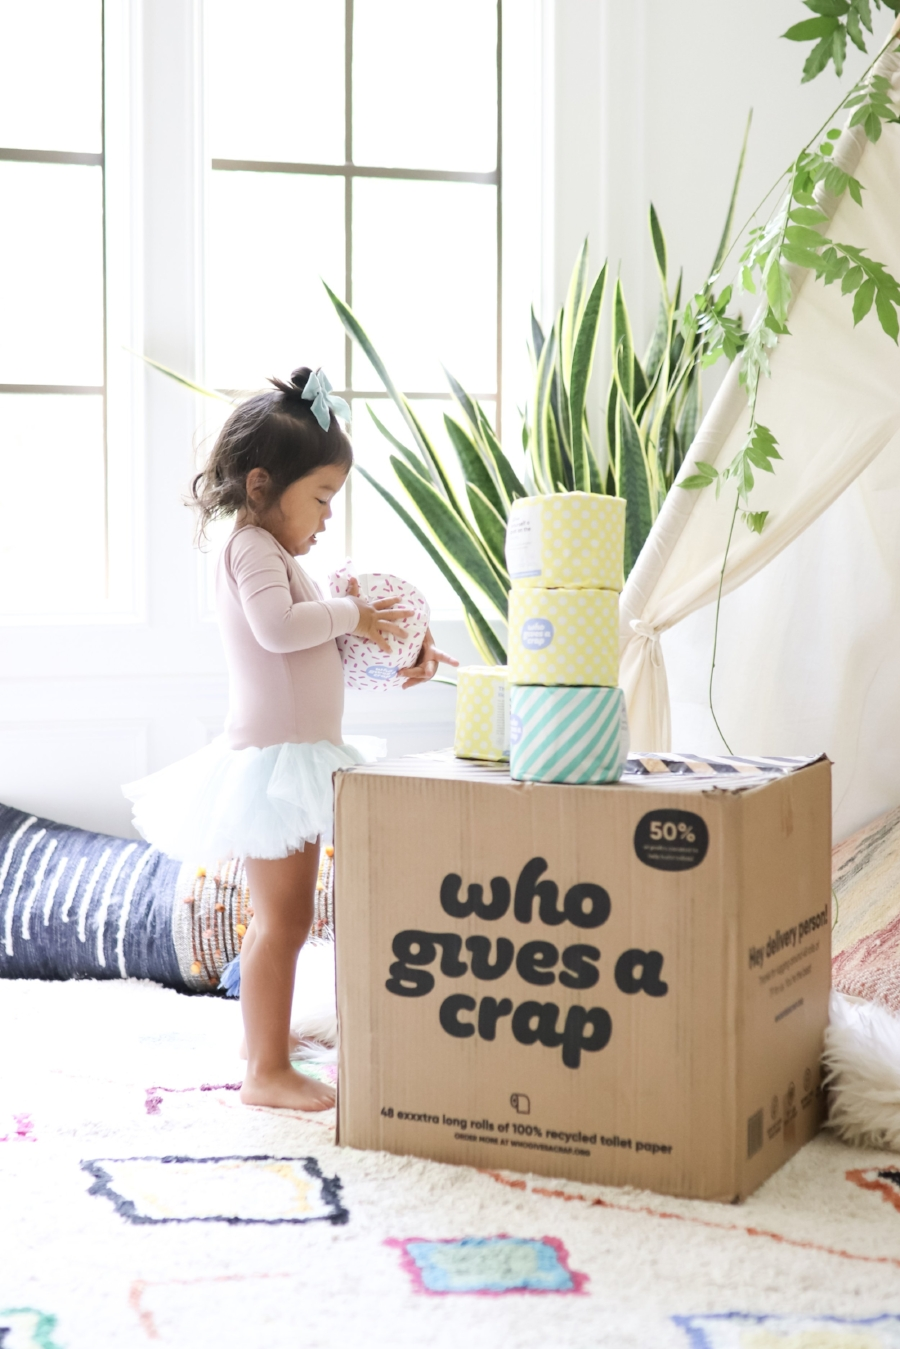 Recycled toilet paper review modern nursery mom blogger joyfullygreen